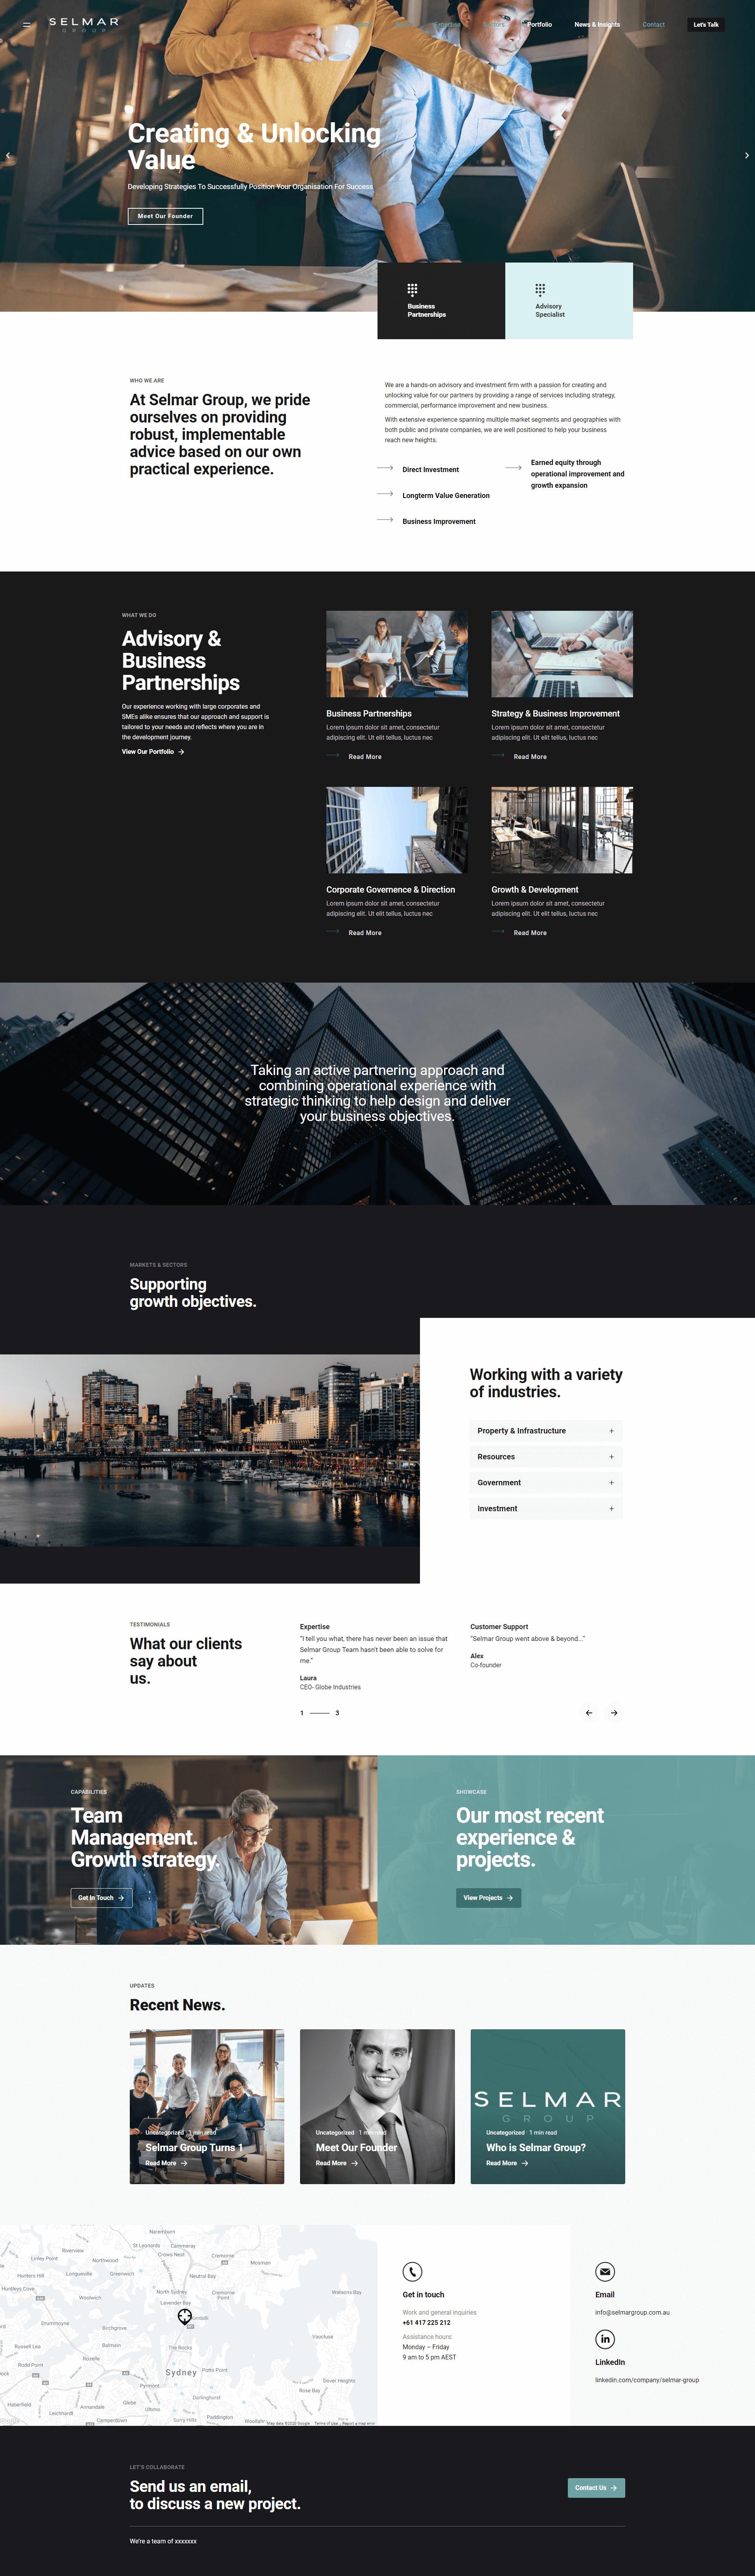 selmar-group-website-design-website-development-branding-logo